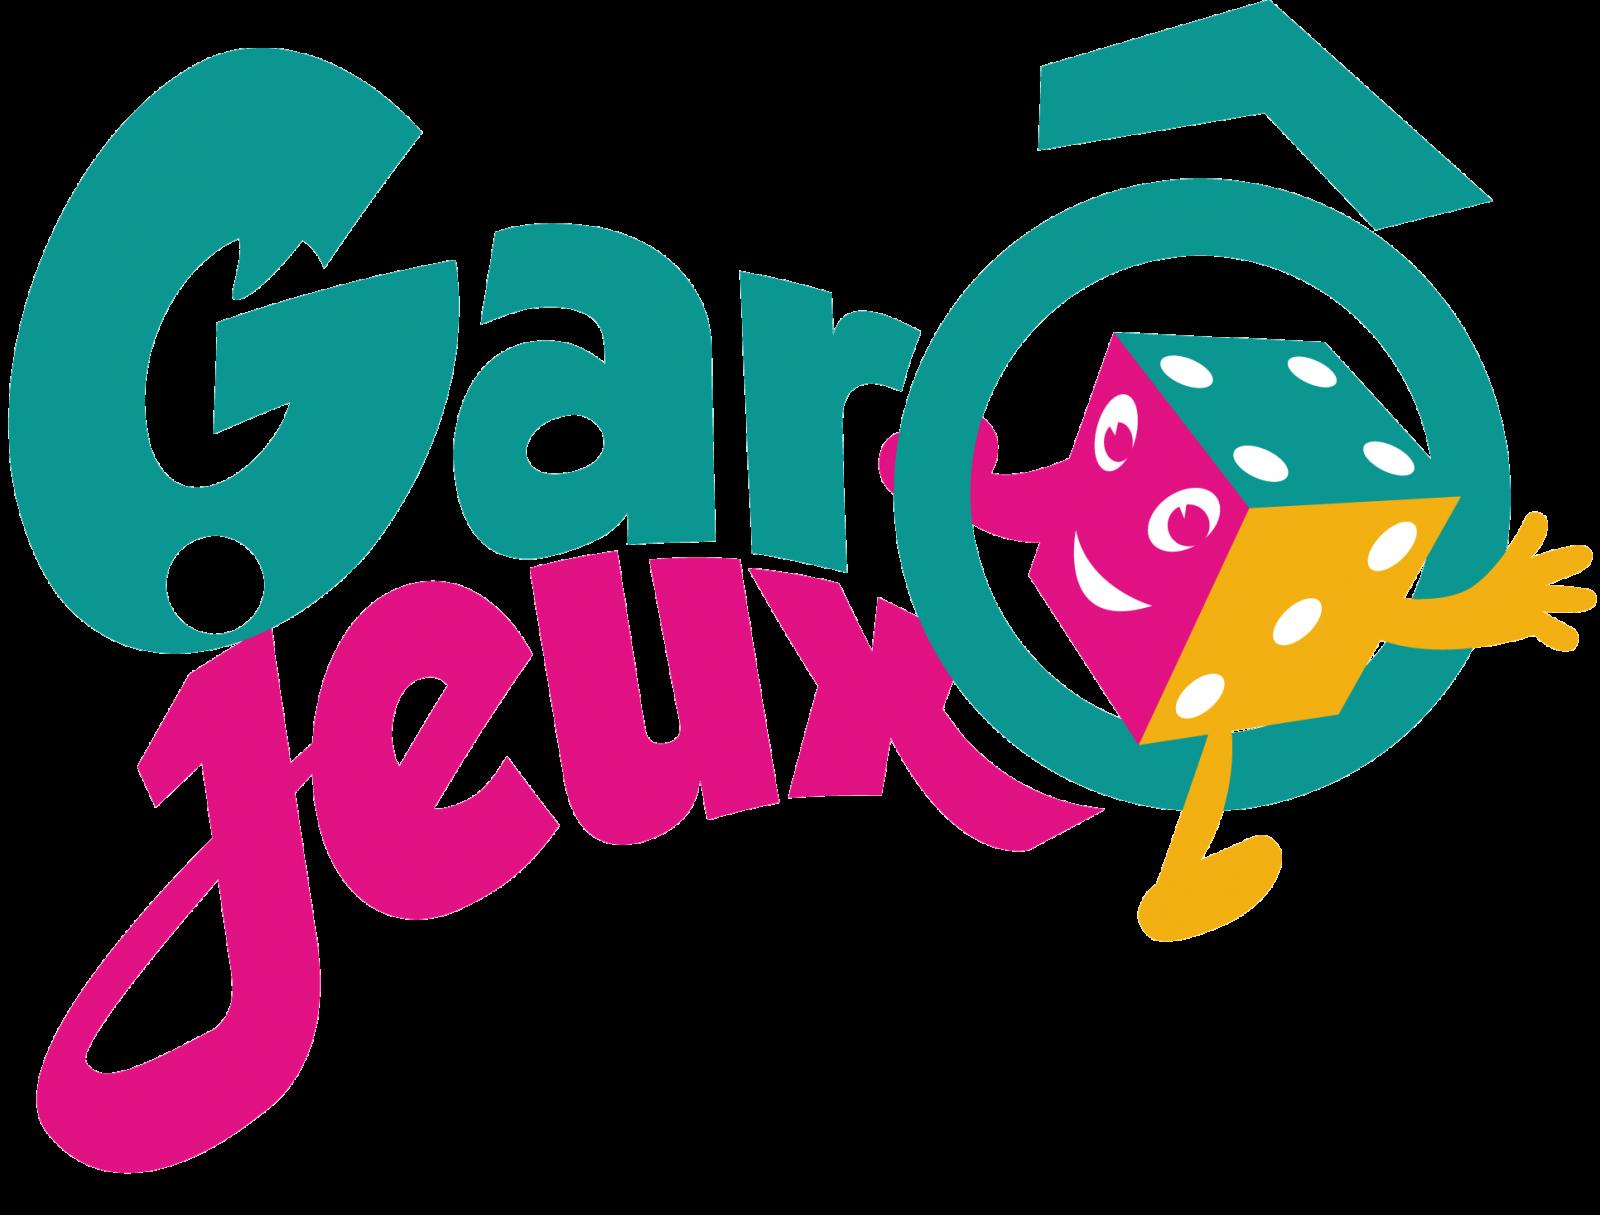 Garôjeux